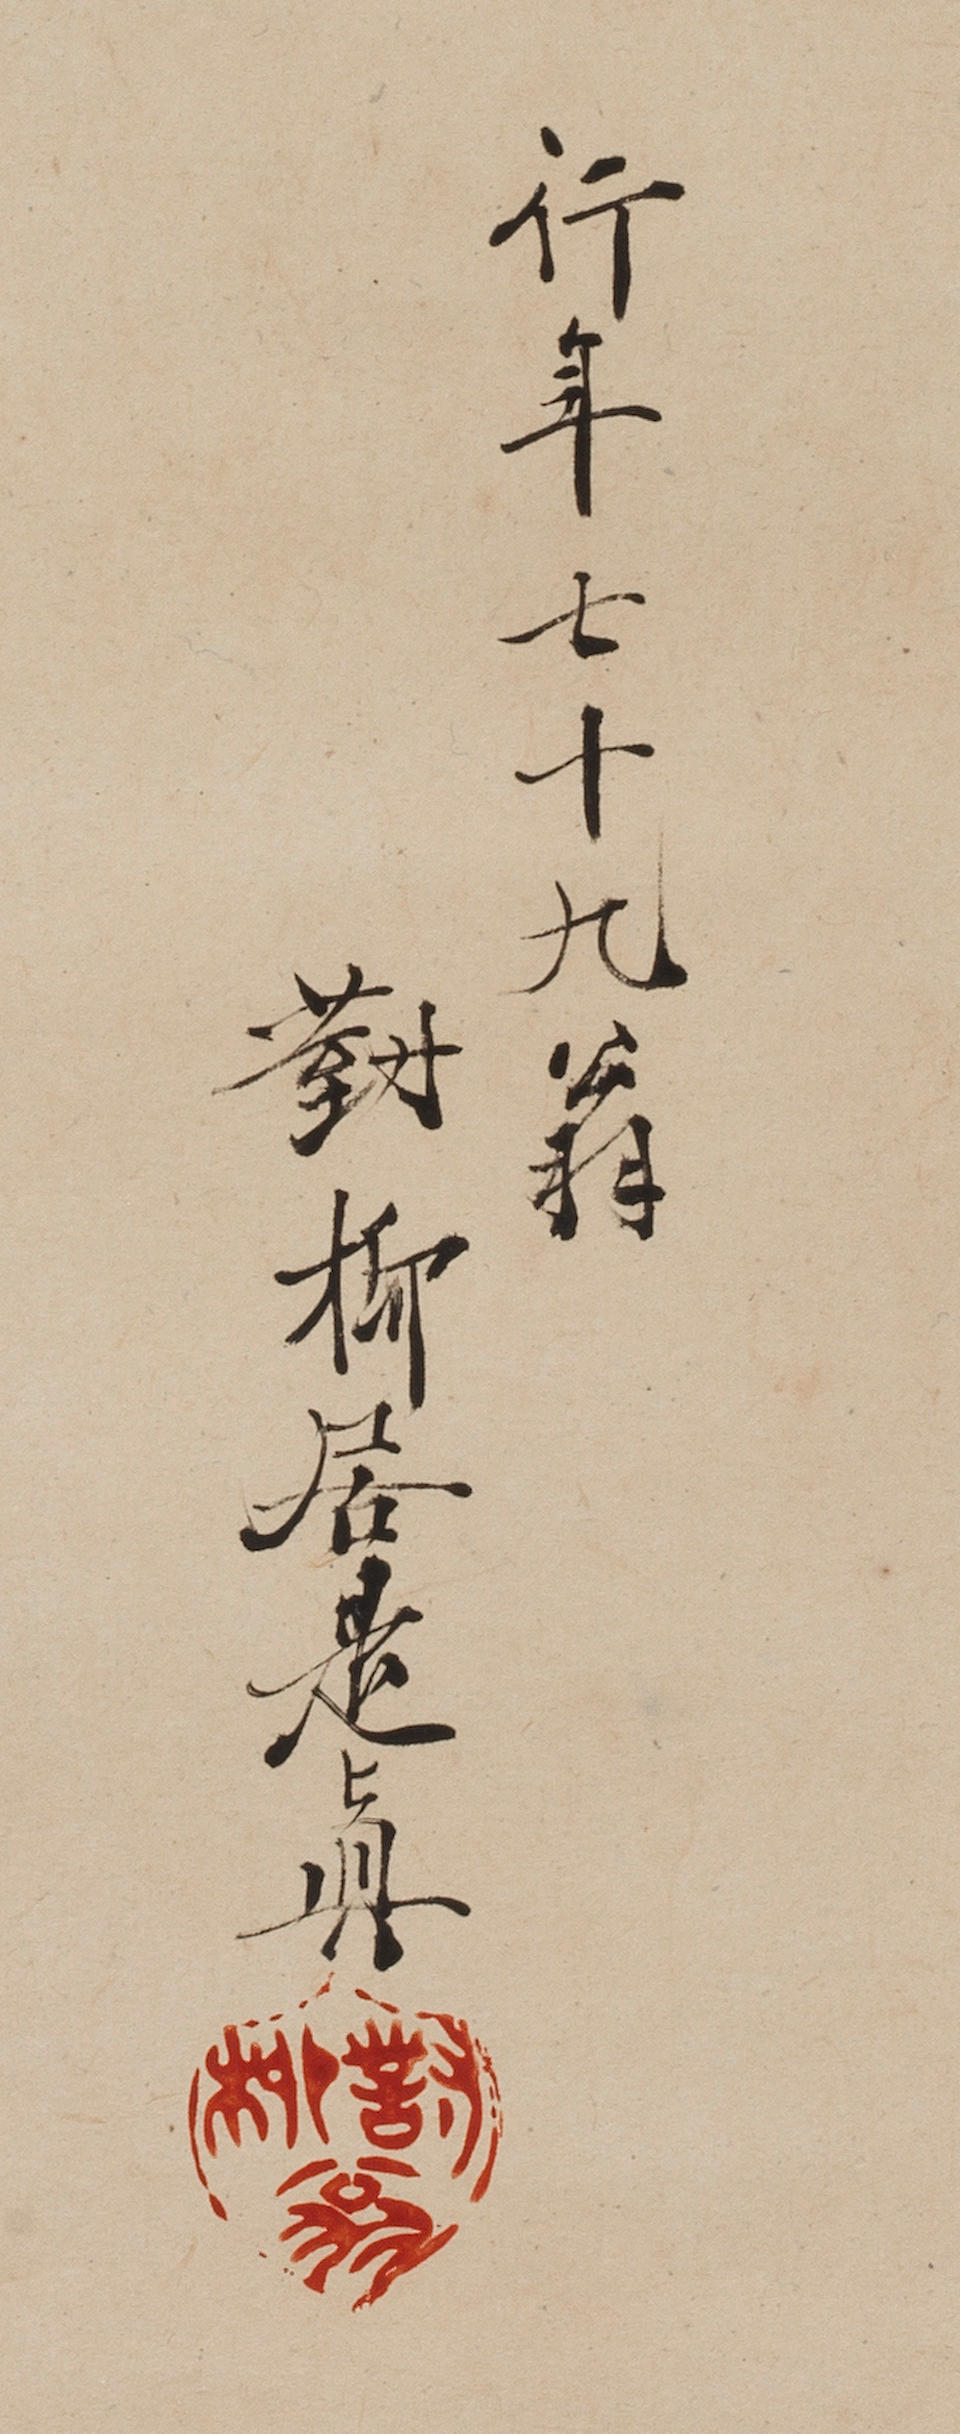 SHIBATA ZESHIN 柴田是真 (1807–1891) TWO CROWS 双烏図紙本漆絵掛軸 Meiji era (1868–1912), circa 1885